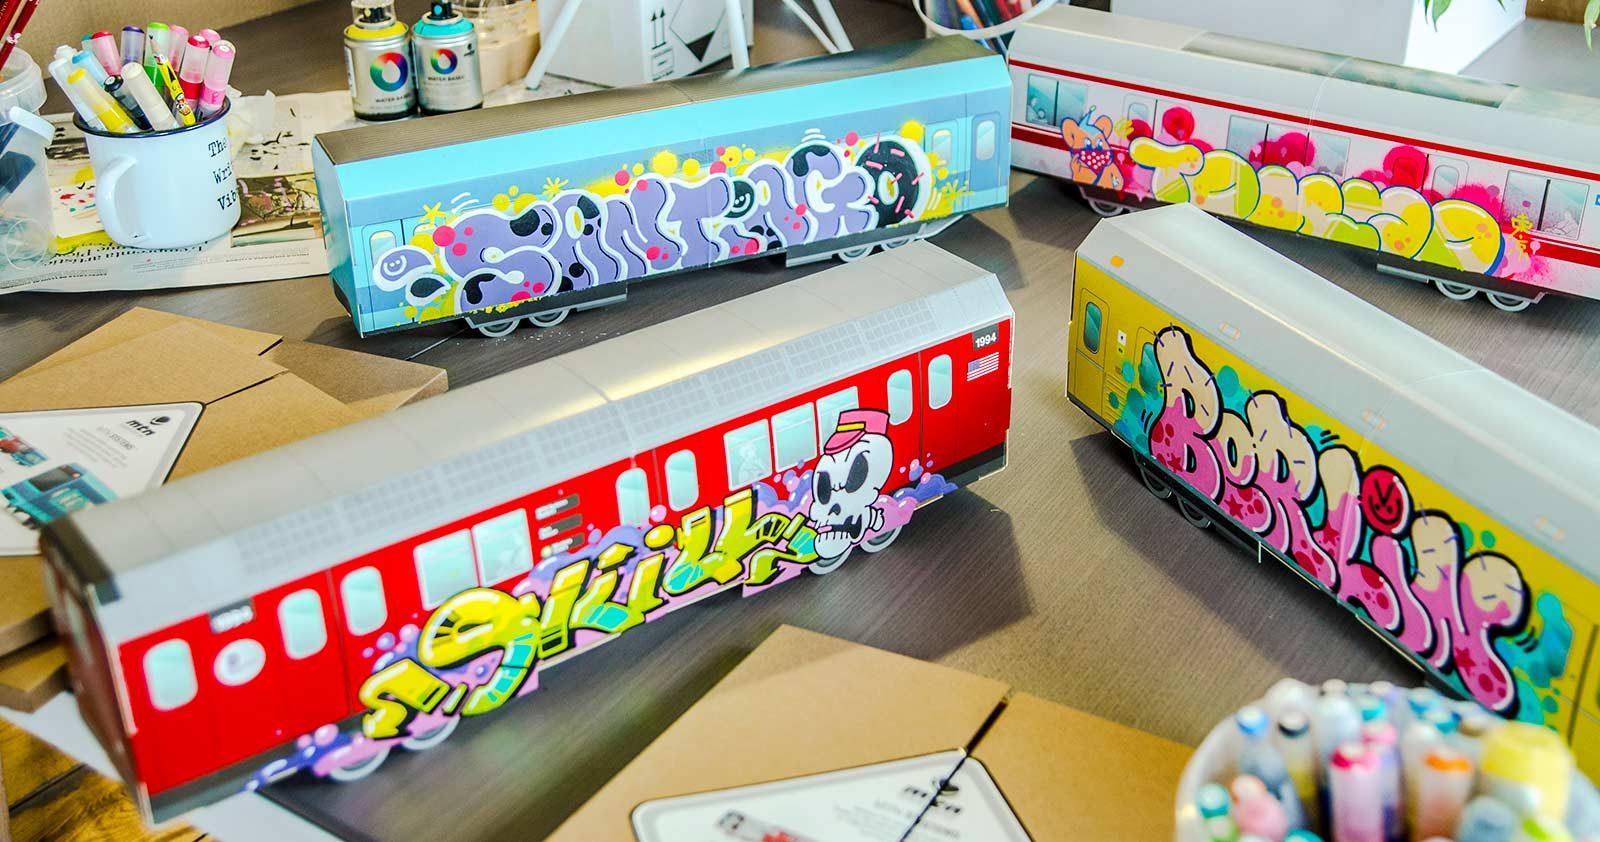 Bienvenue au club Graffiti & Modélisme